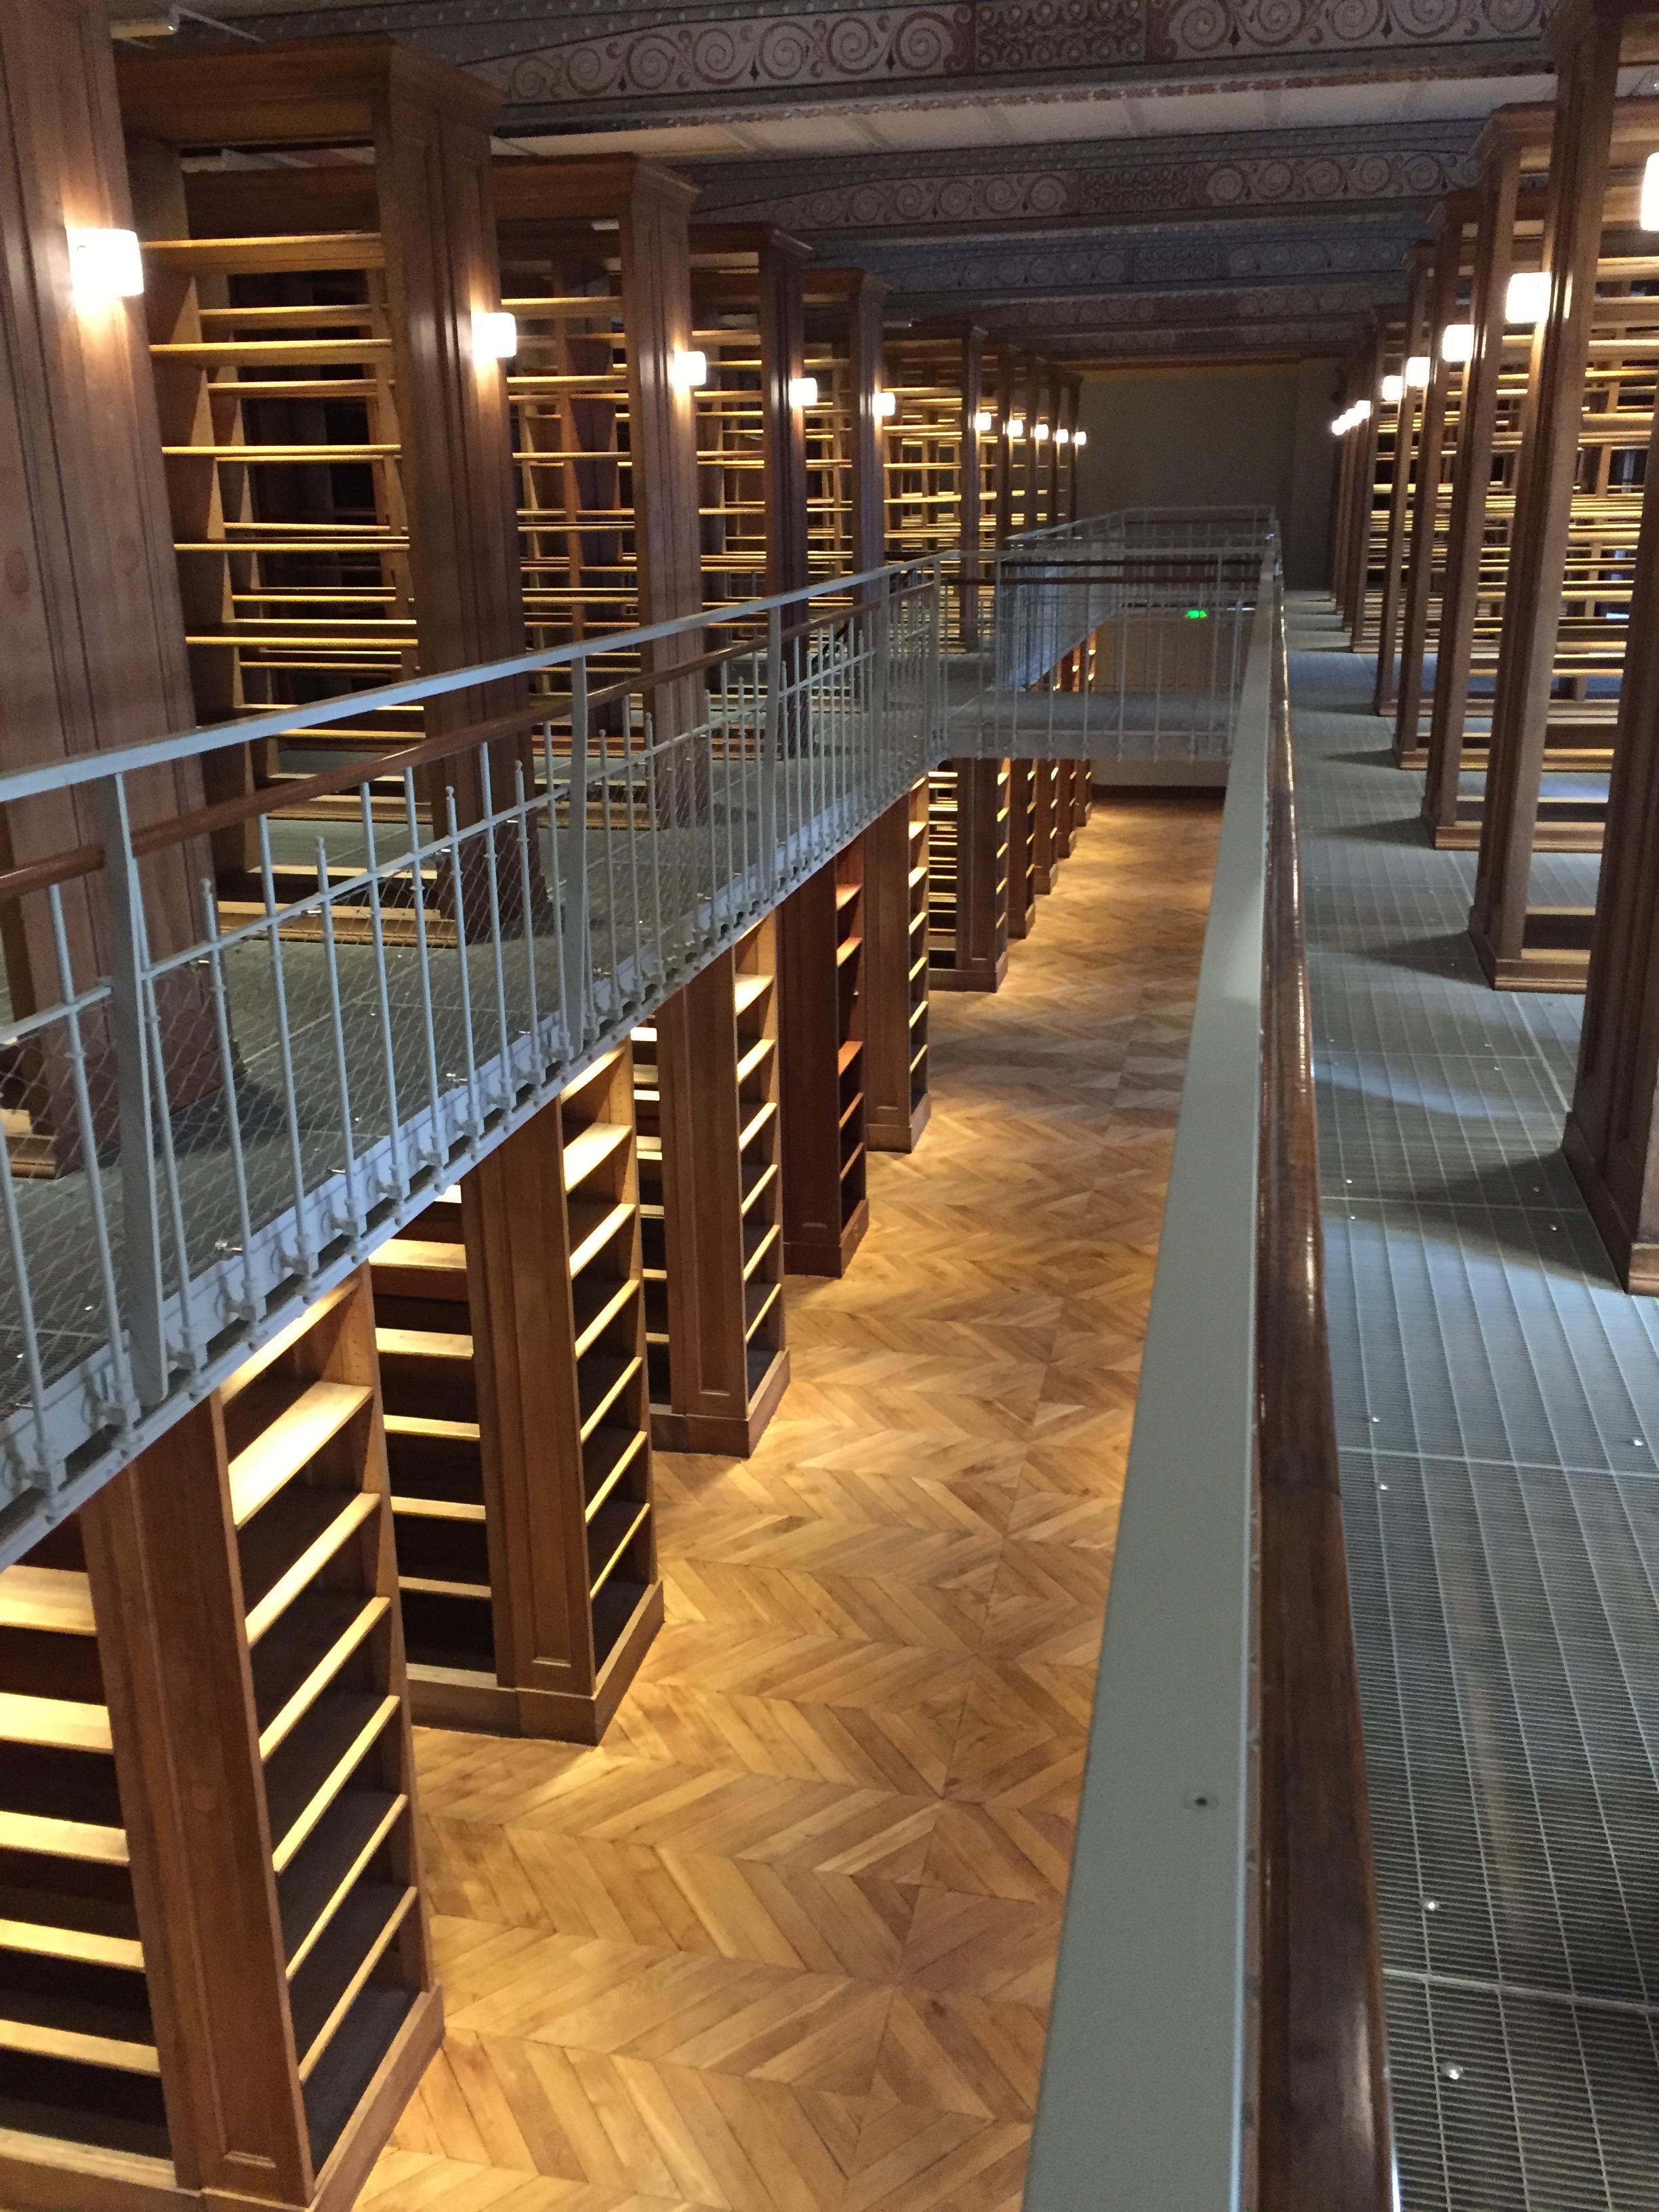 psl_psl-explore_enc_bibliotheque_demenagement_rayons